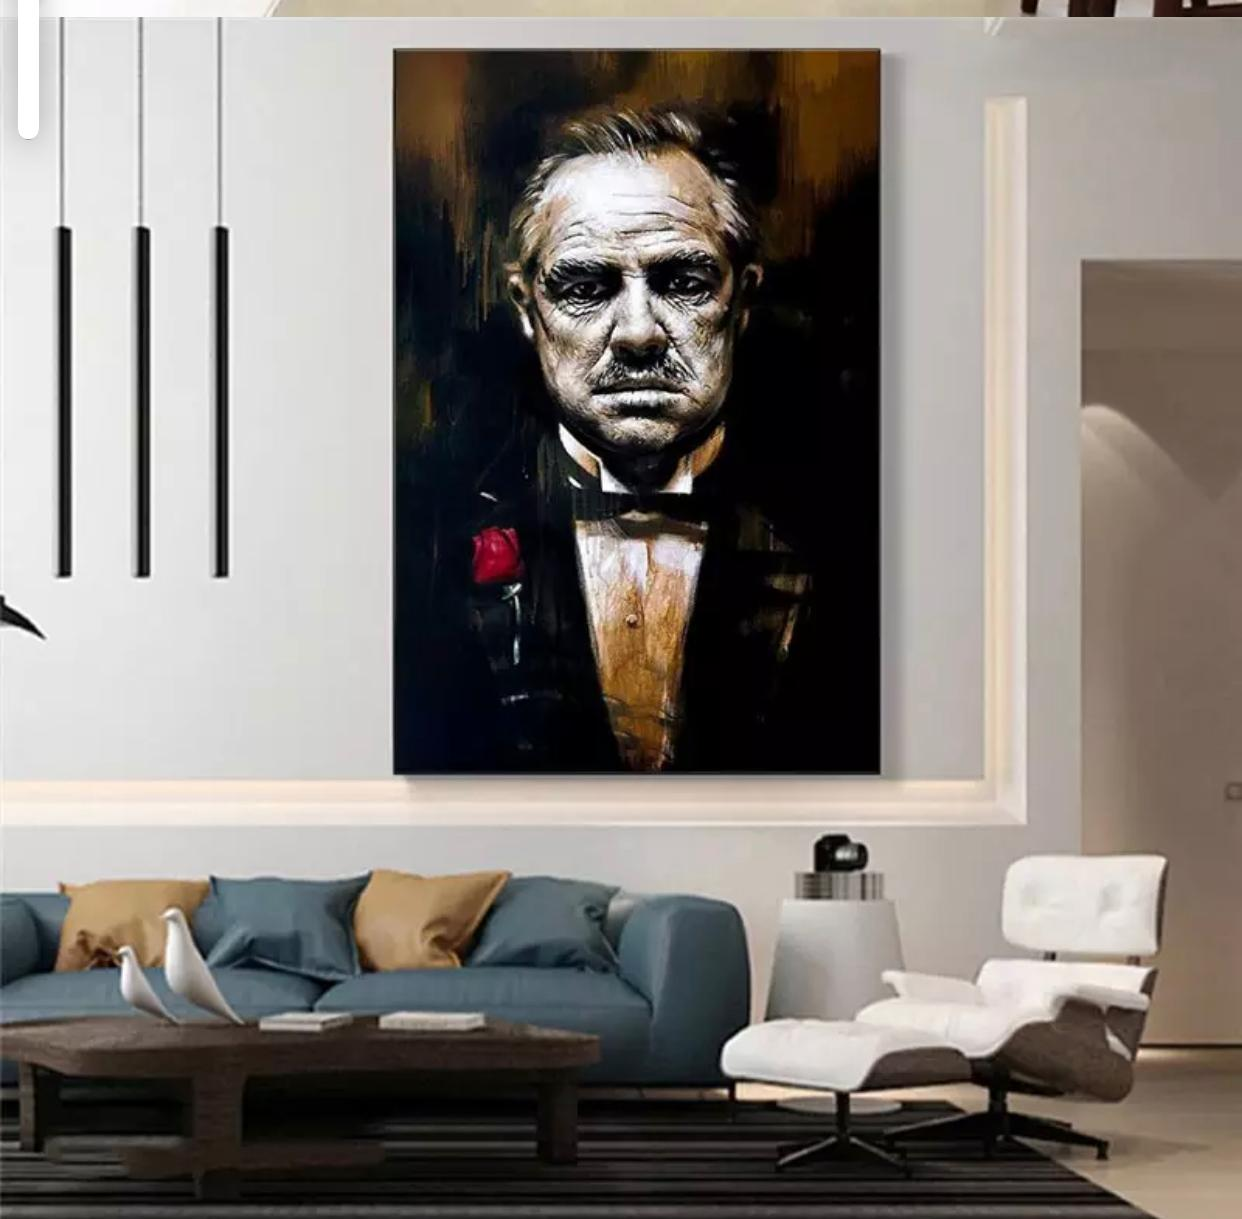 Quadro Vito Corleone: O Poderoso Chefão Canvas Moldura Premium 74x93cm - EV